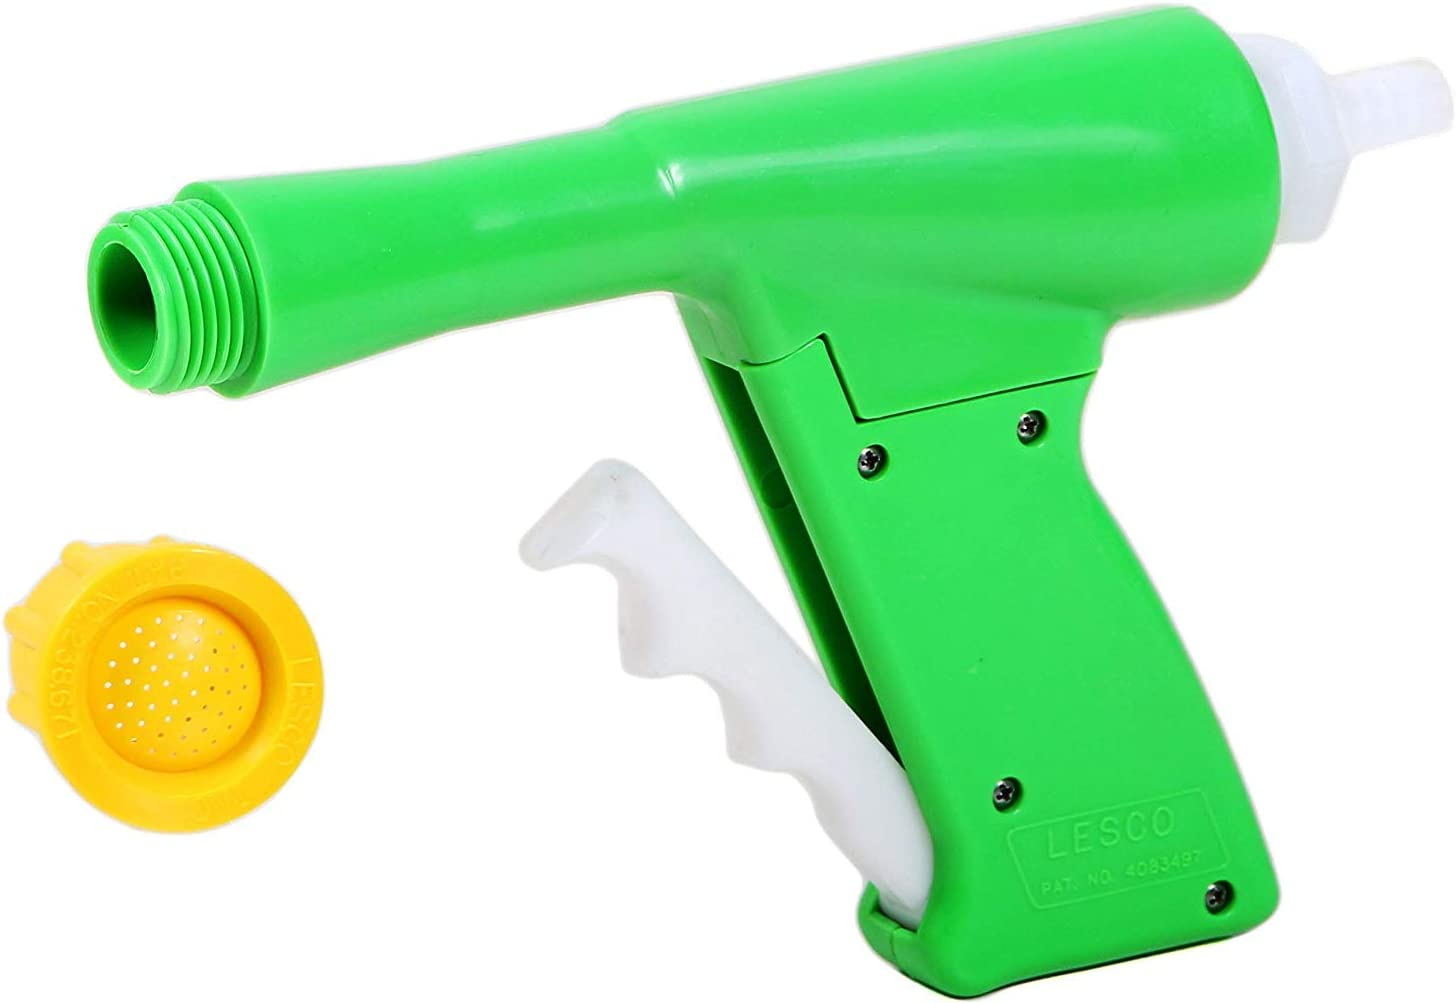 Rittenhouse Lesco Chemlawn Gun - gpm Nozzle 2.0 40% OFF Cheap Sale Yellow Made 1 year warranty